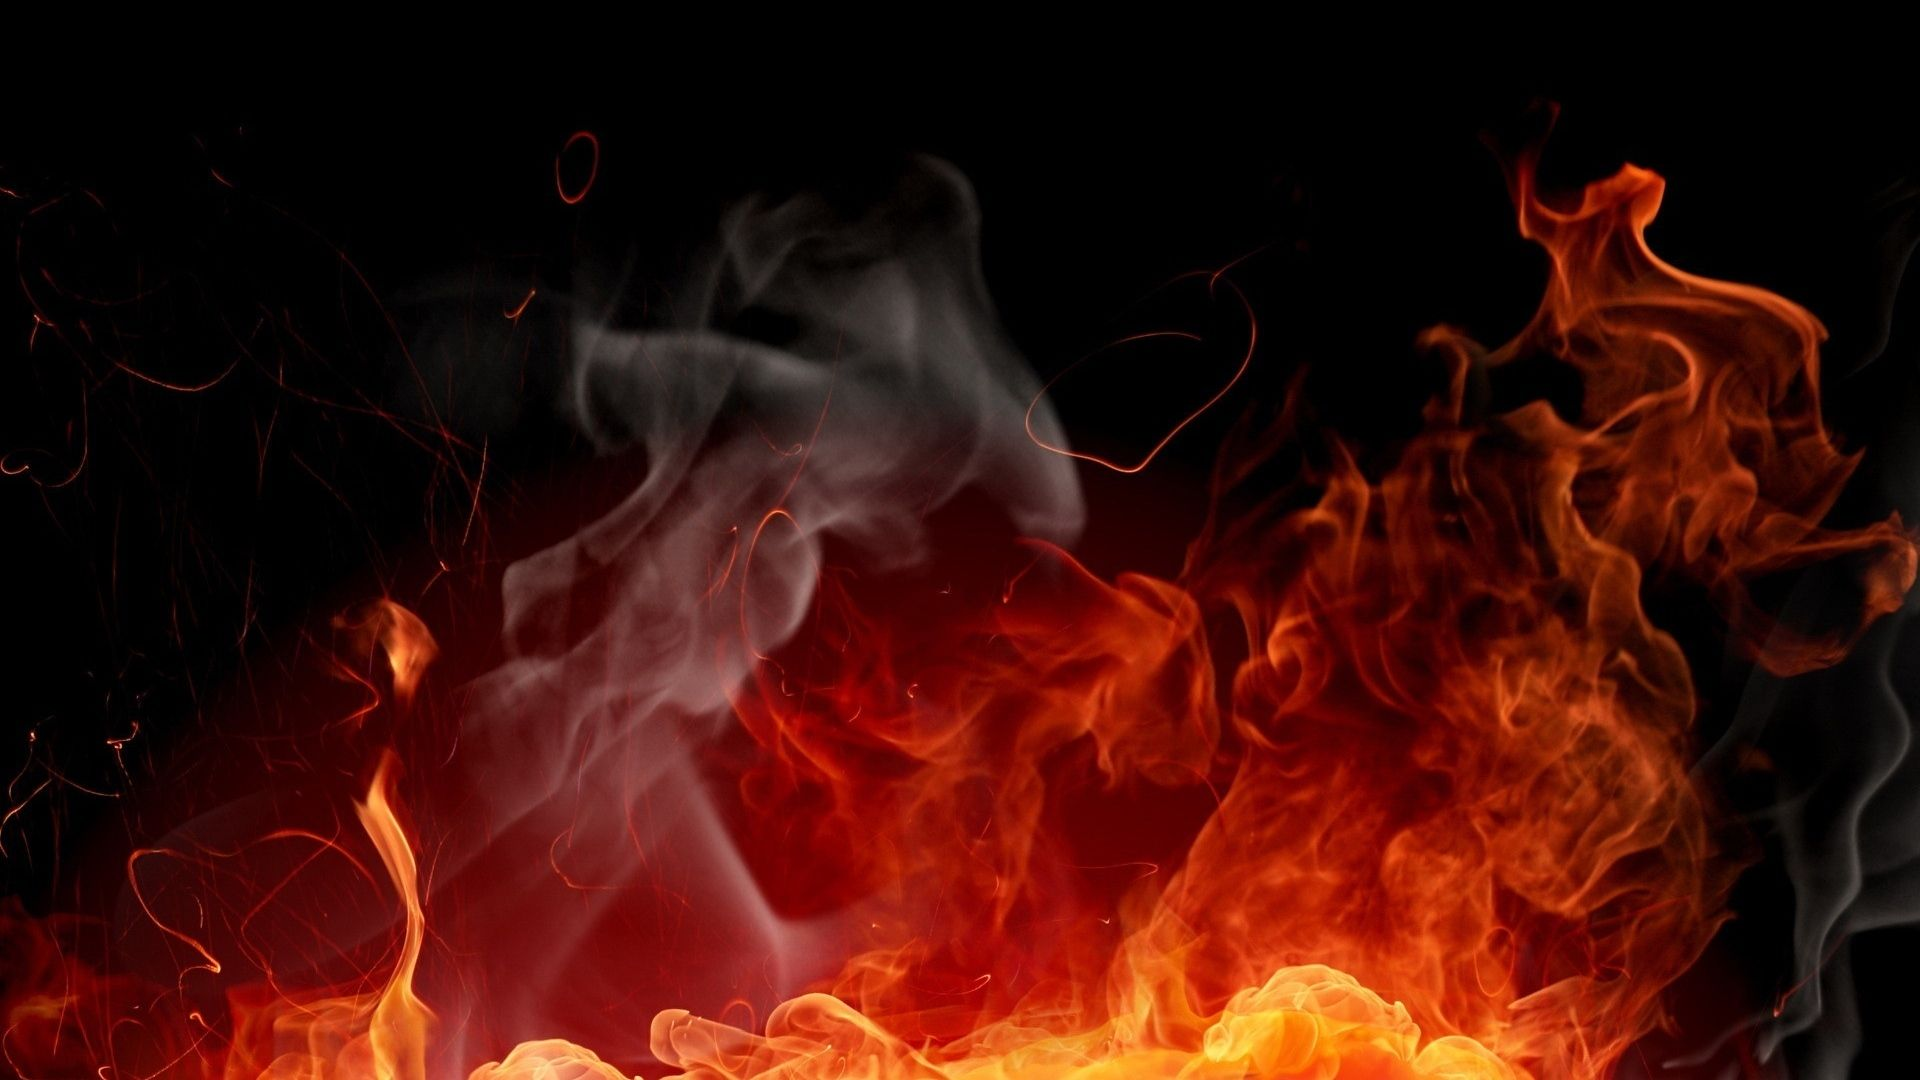 wallpaper flame burn spark